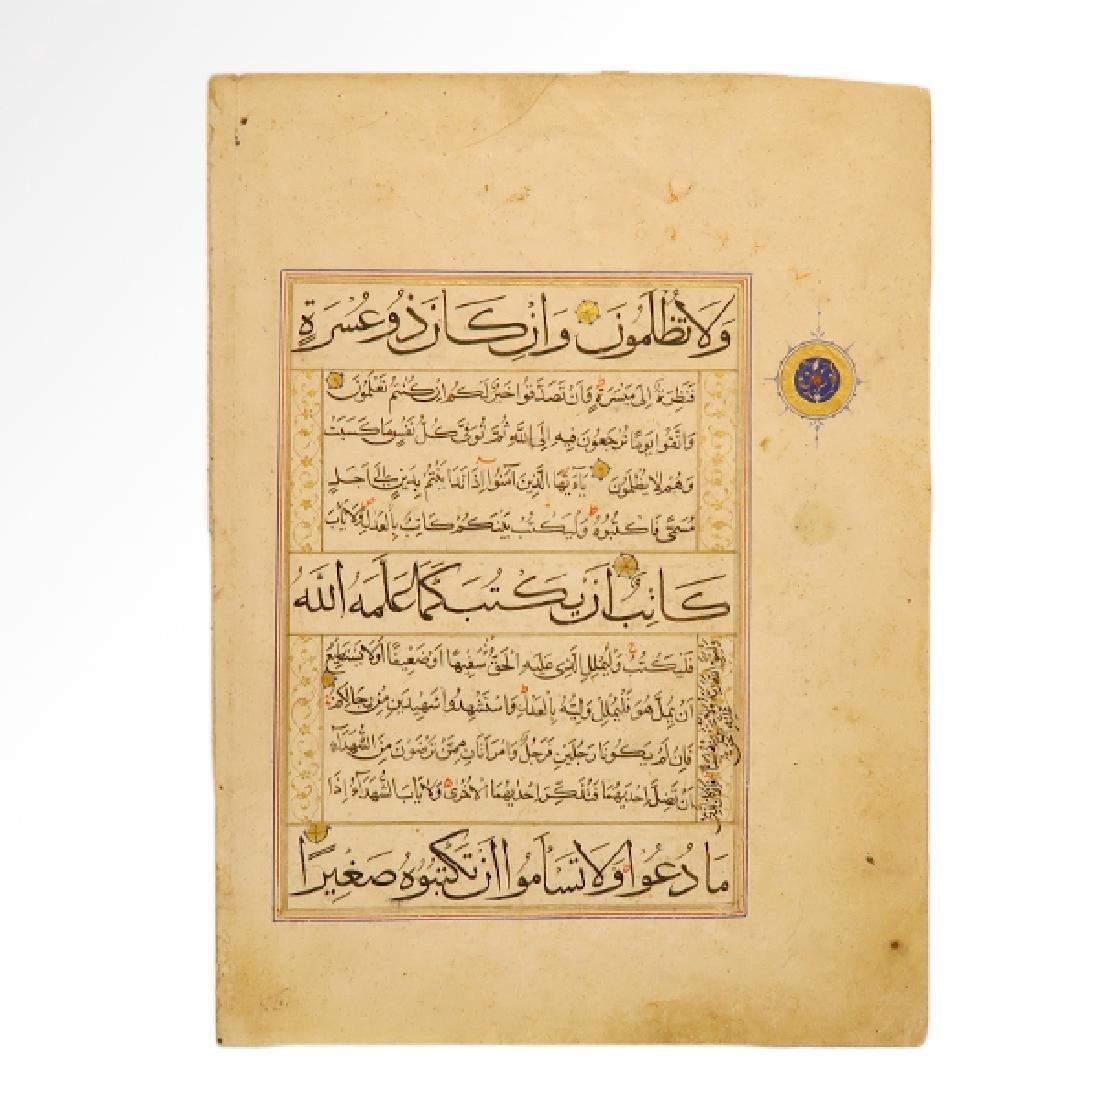 Islamic Illuminated Manuscript Leaf, 15th Century A.D.